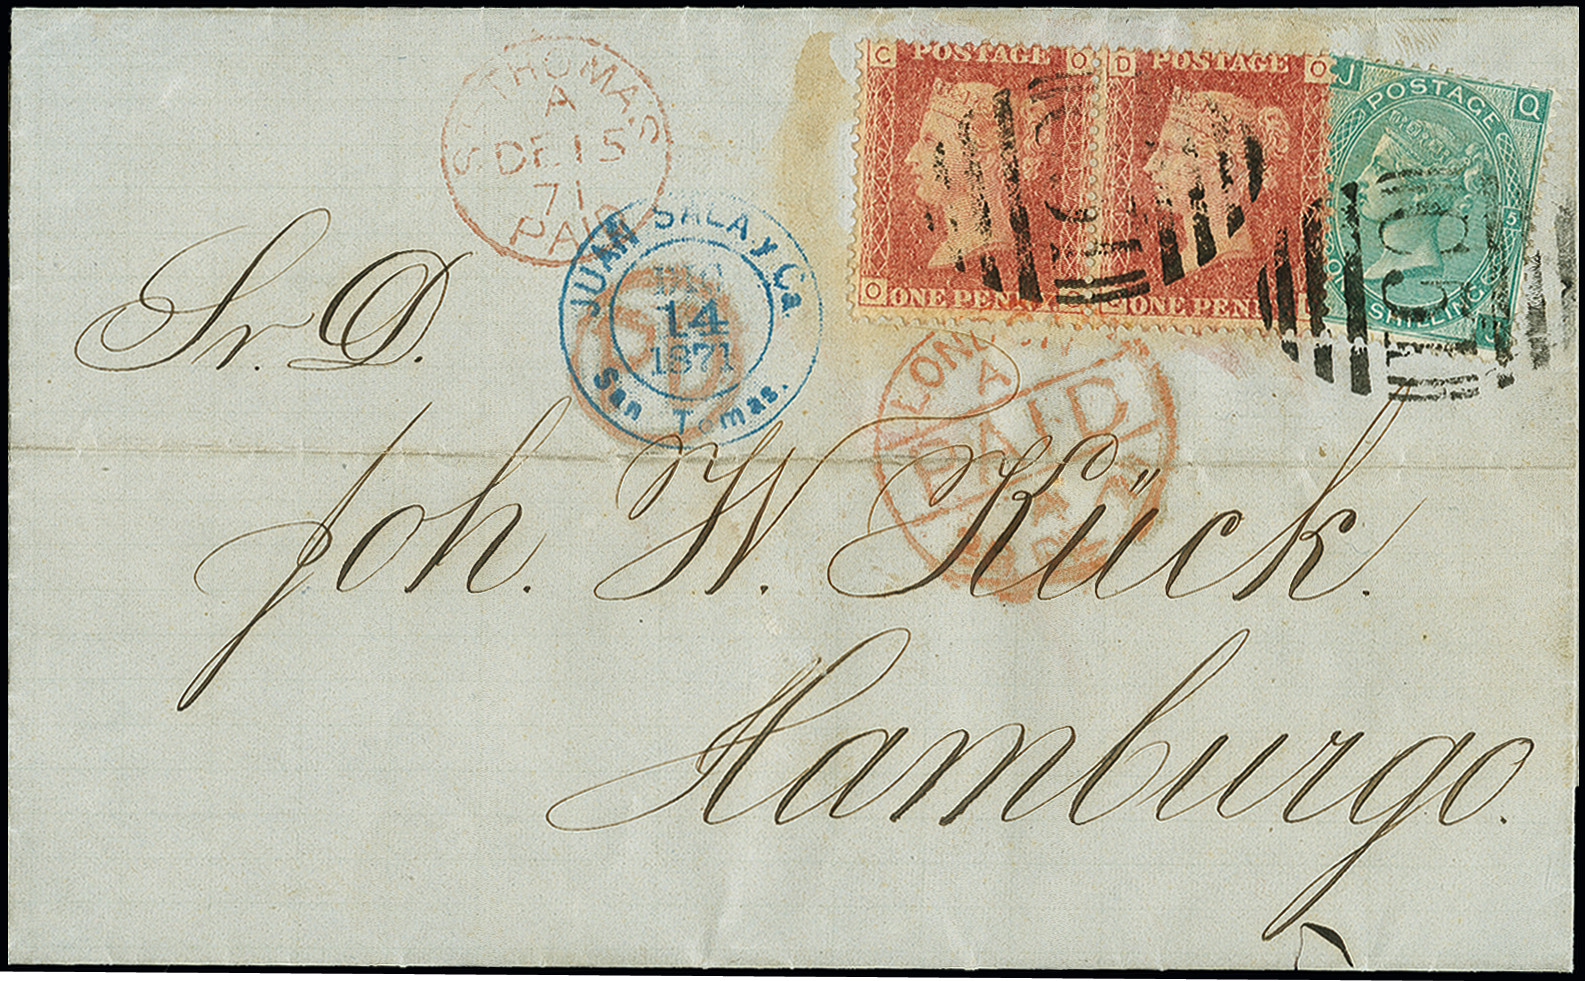 368 / März 2019 - 6159 | Heinrich Köhler Auktionshaus GmbH